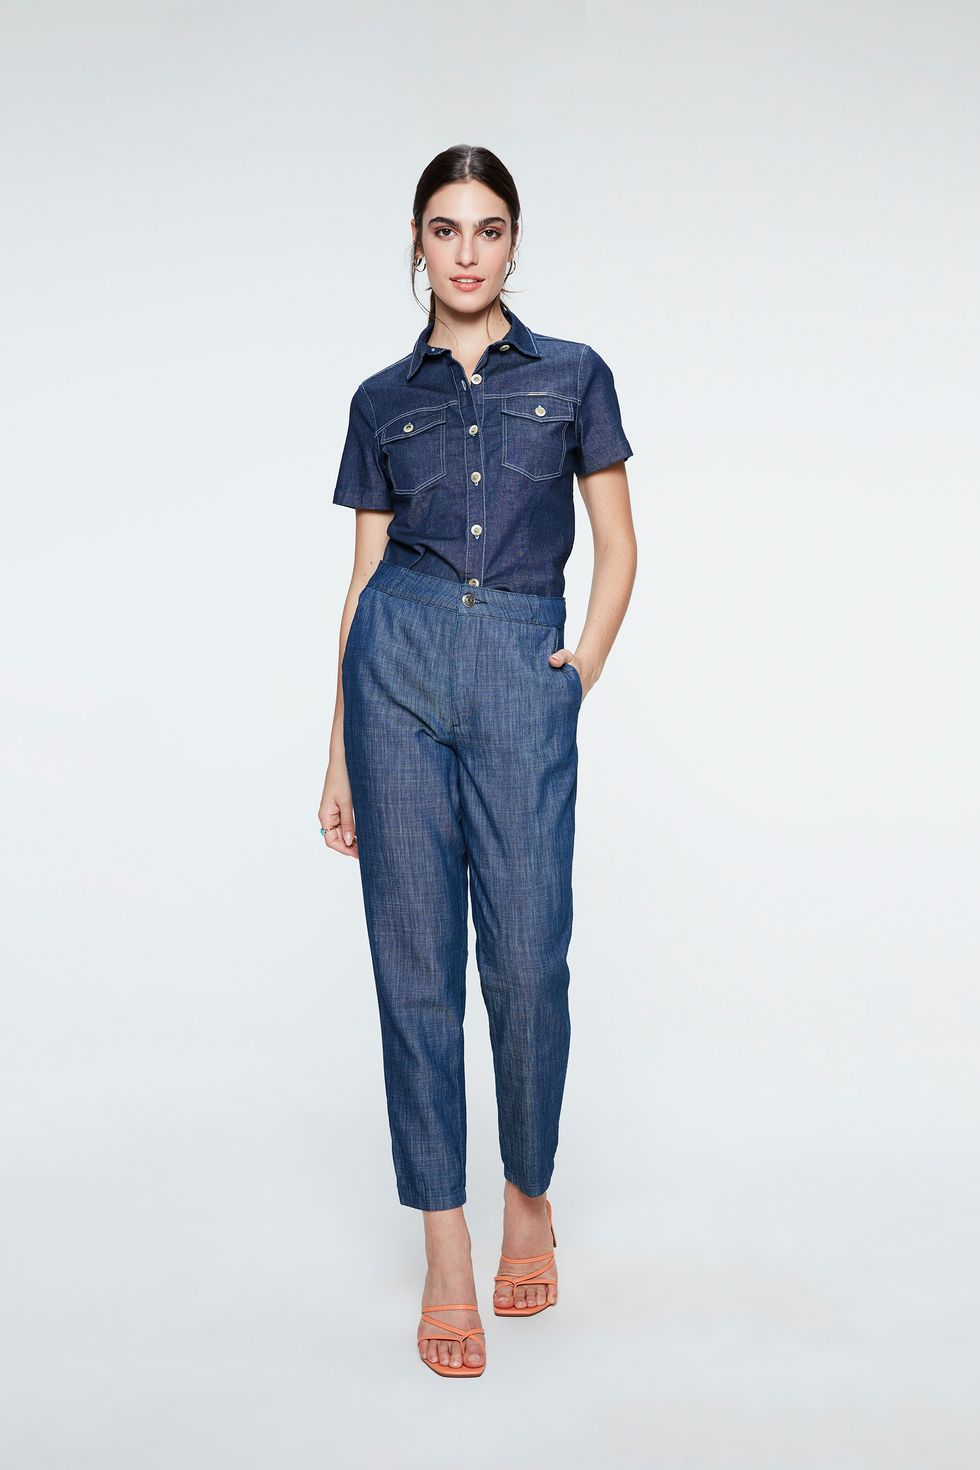 Calca-Jeans-Chino-Cropped-Feminina-Frente--